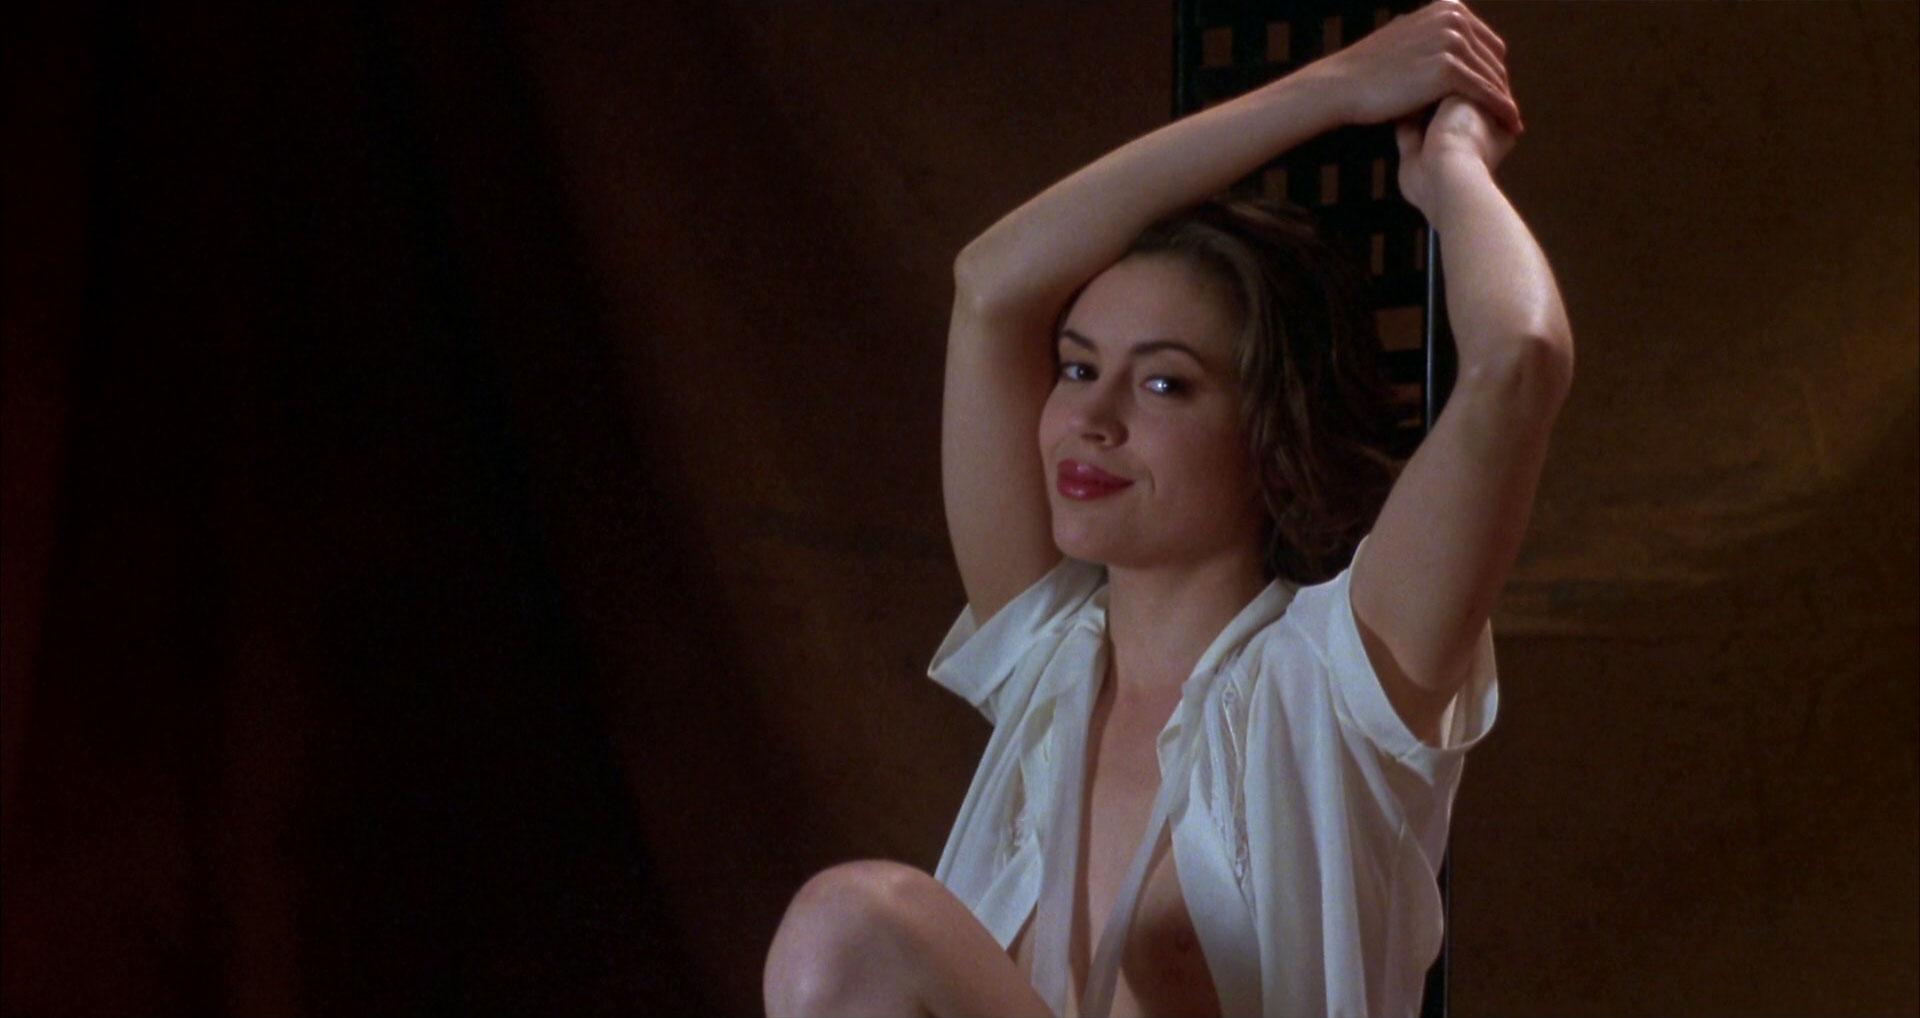 Bound 1996 full movie crime romance thriller - 2 7